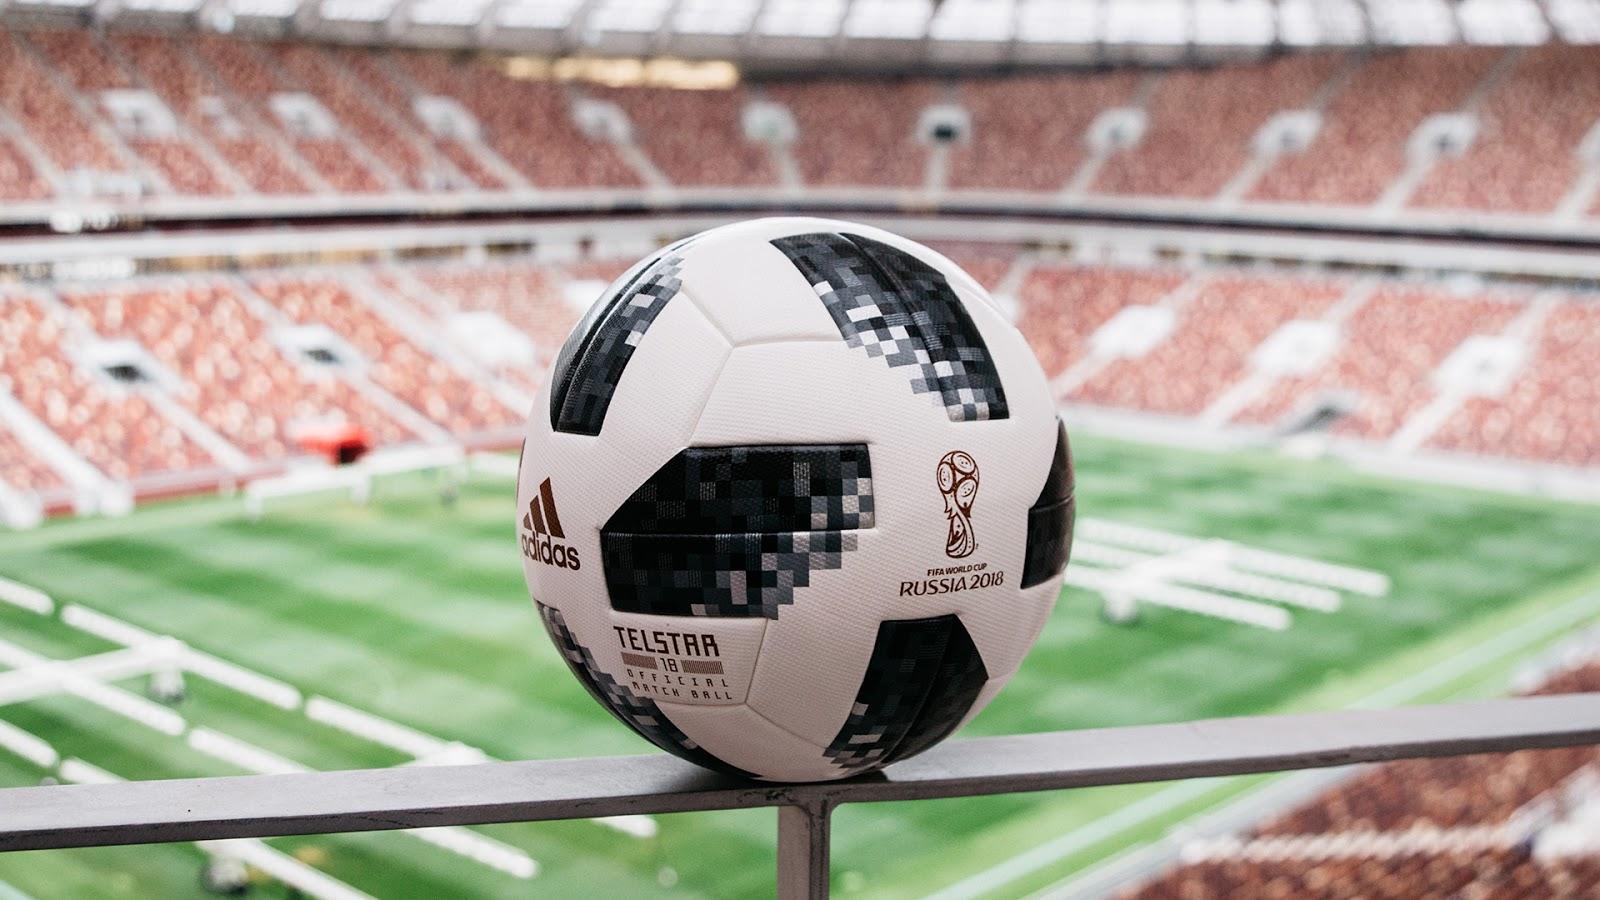 Adidas Telstar 18 - Bola Resmi Piala Dunia FIFA 2018 Rusia